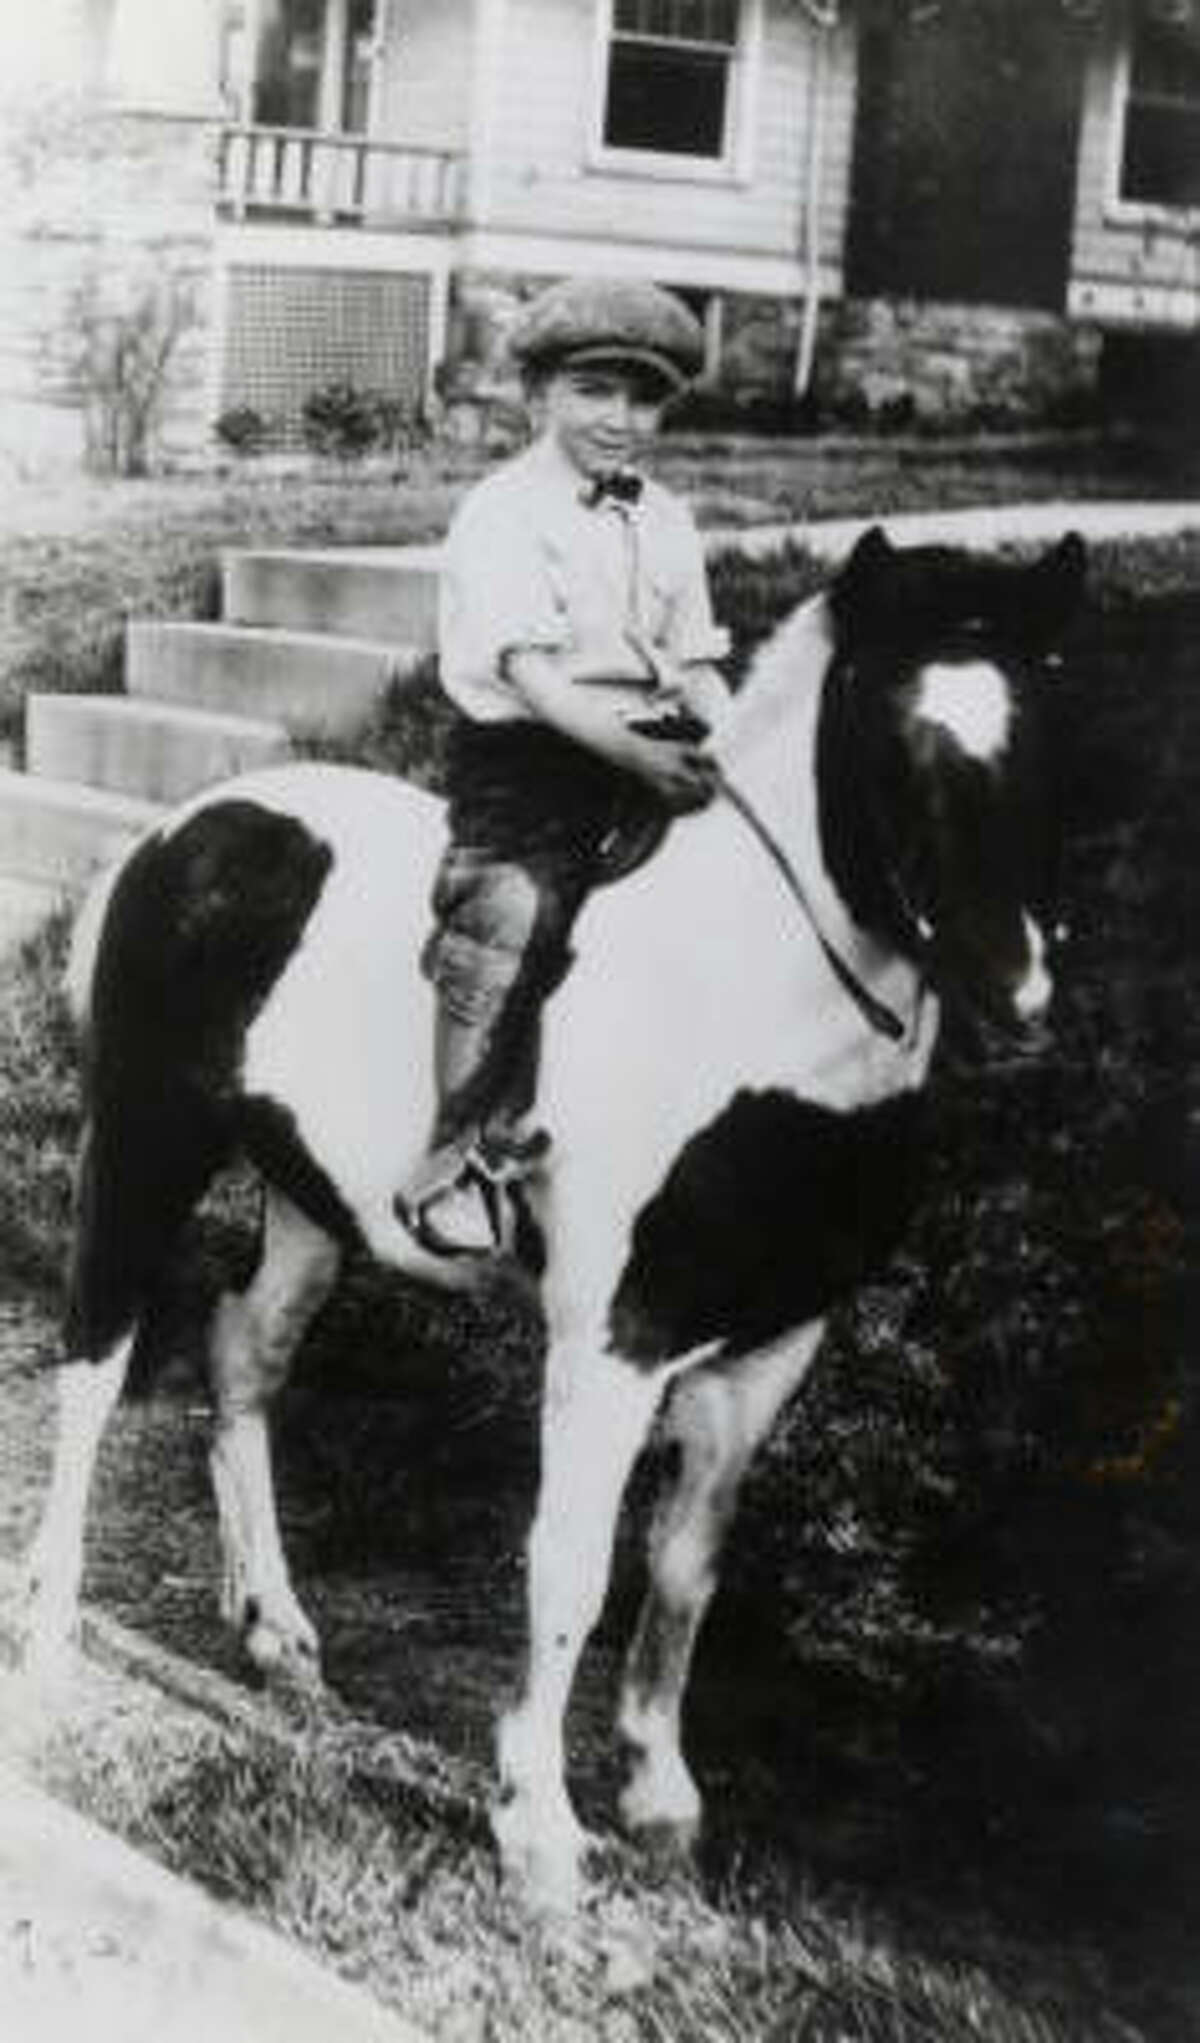 Walter Cronkite at age 7.